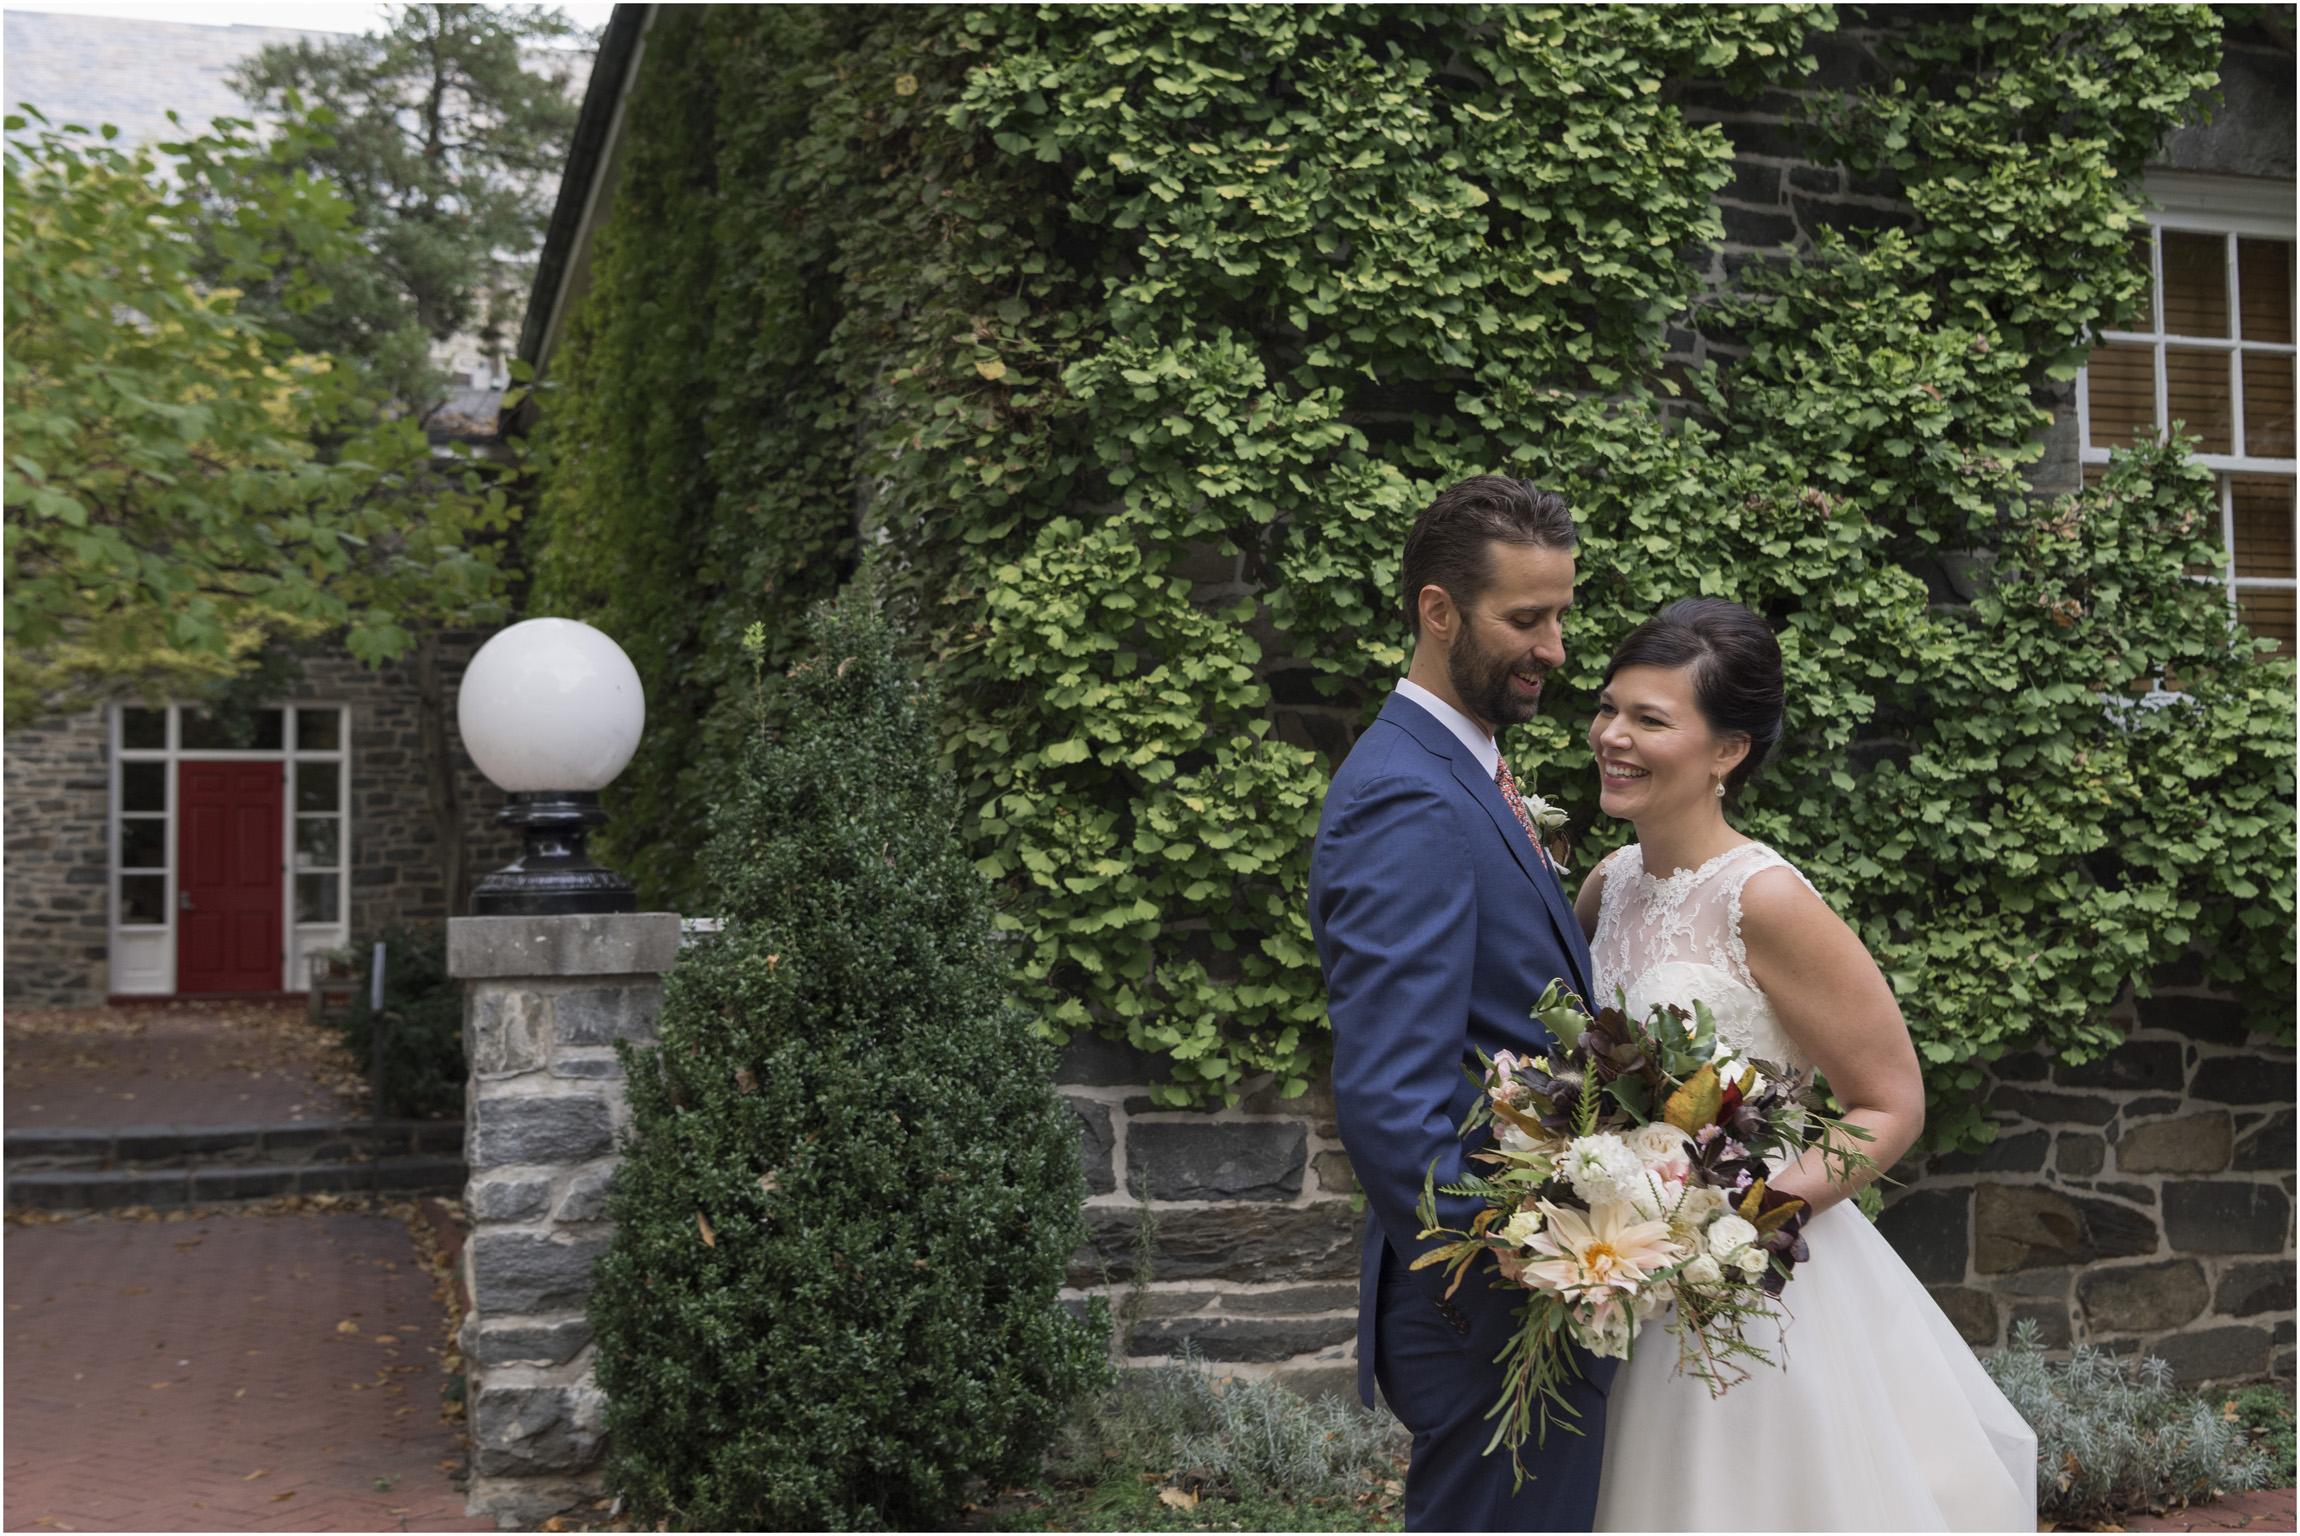 ©FianderFoto_Melissa_Mark_Wedding_Maryland_019.jpg